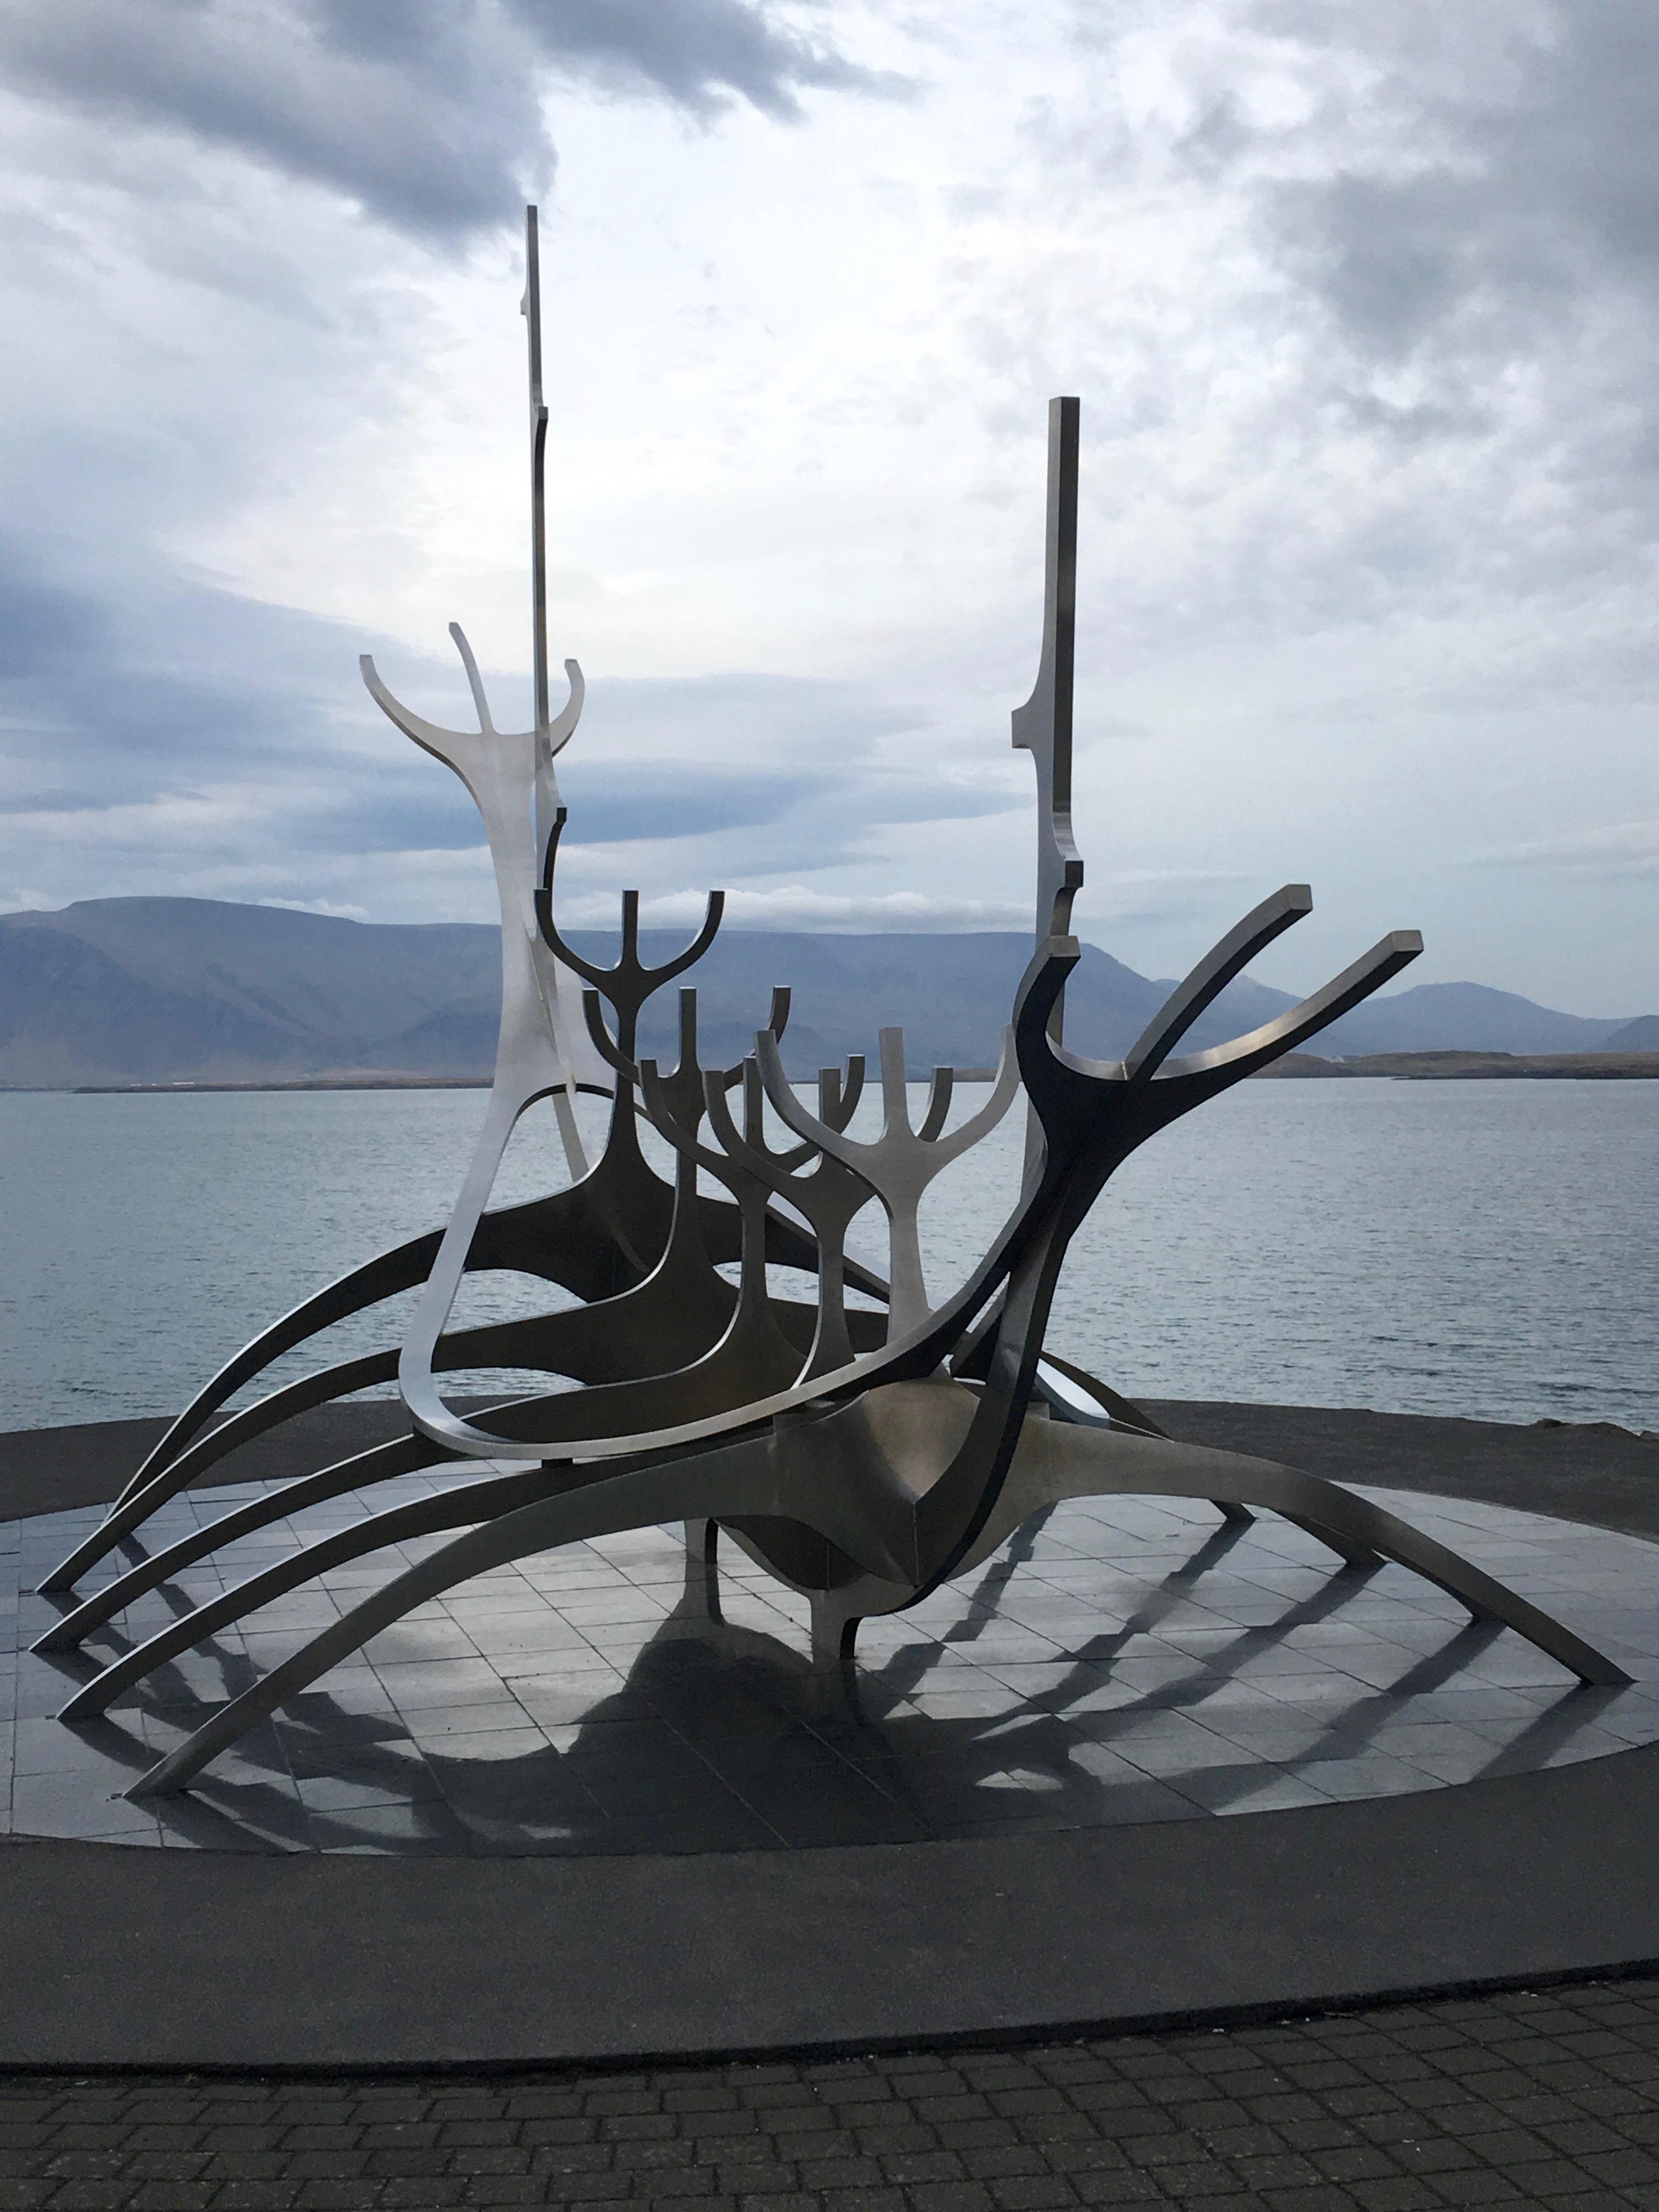 Caption: Sun Voyager sculpture in Reykjavik., Credit: Tonya Fitzpatrick